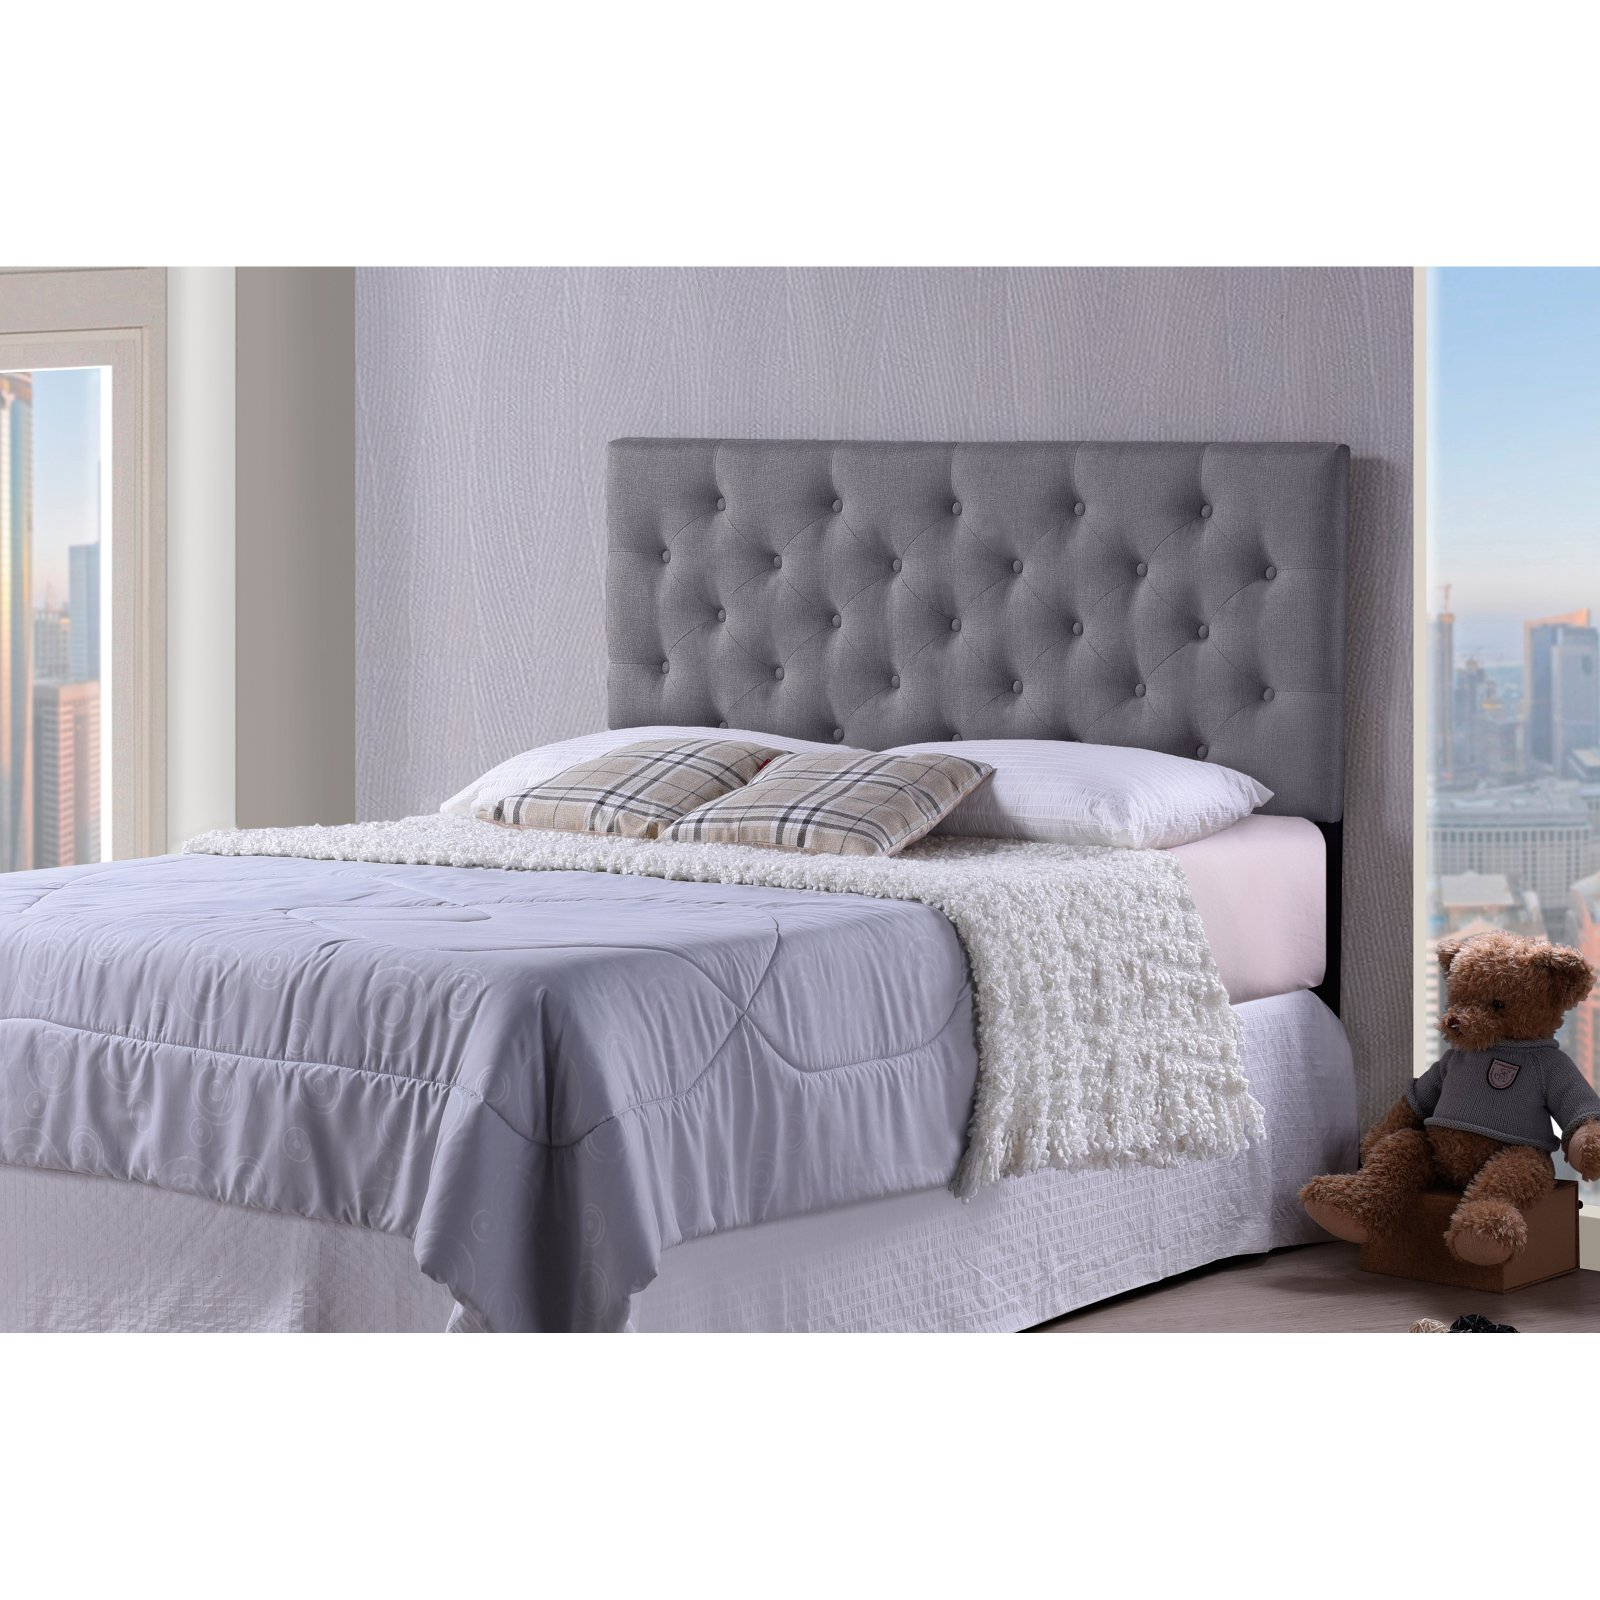 Baxton Studio Viviana Modern And Contemporary Fabric Upholstered